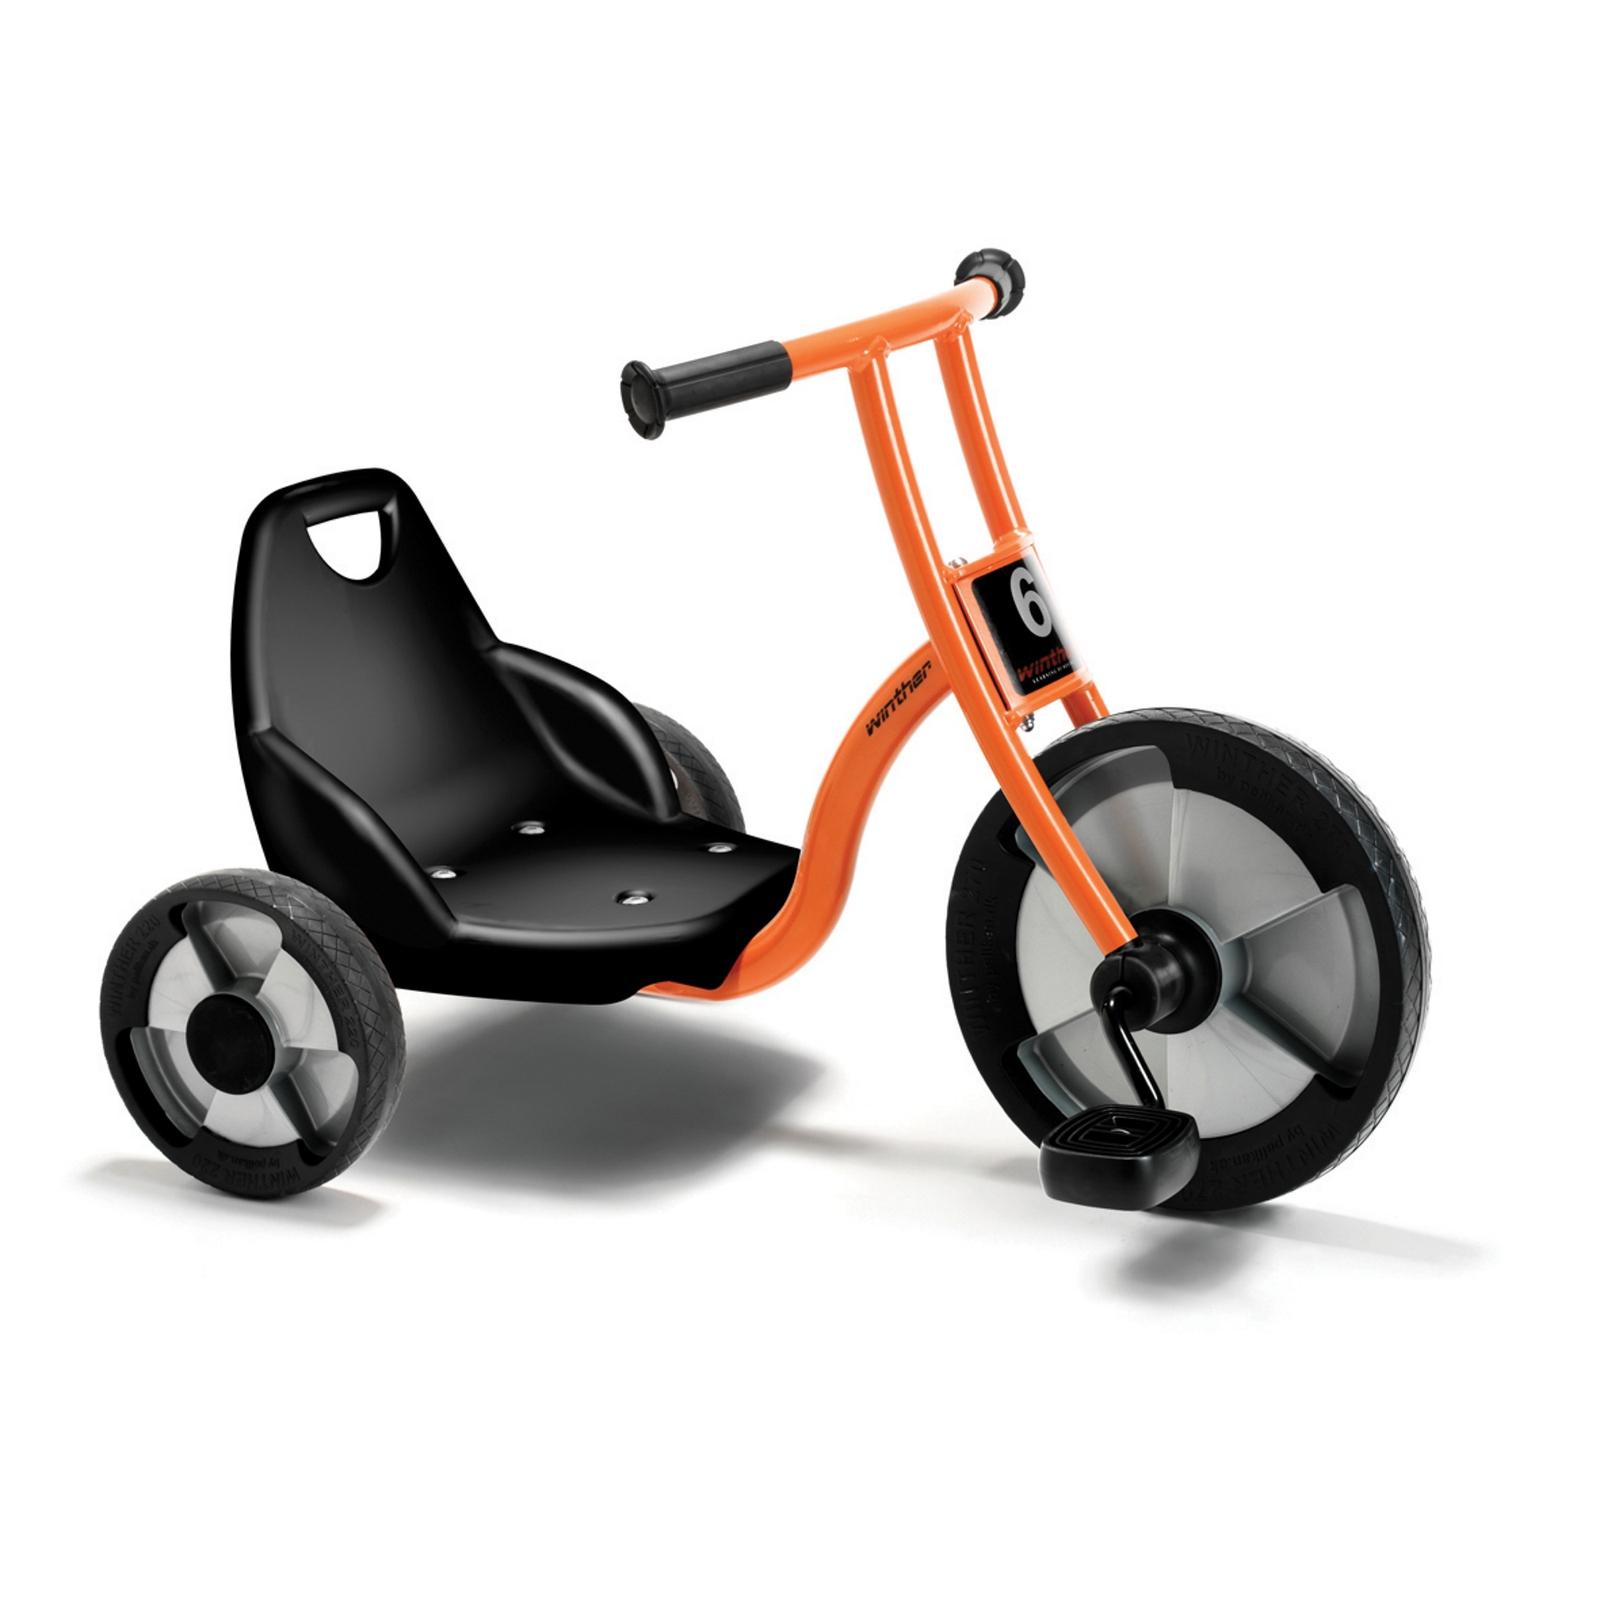 Circleline Easy Rider